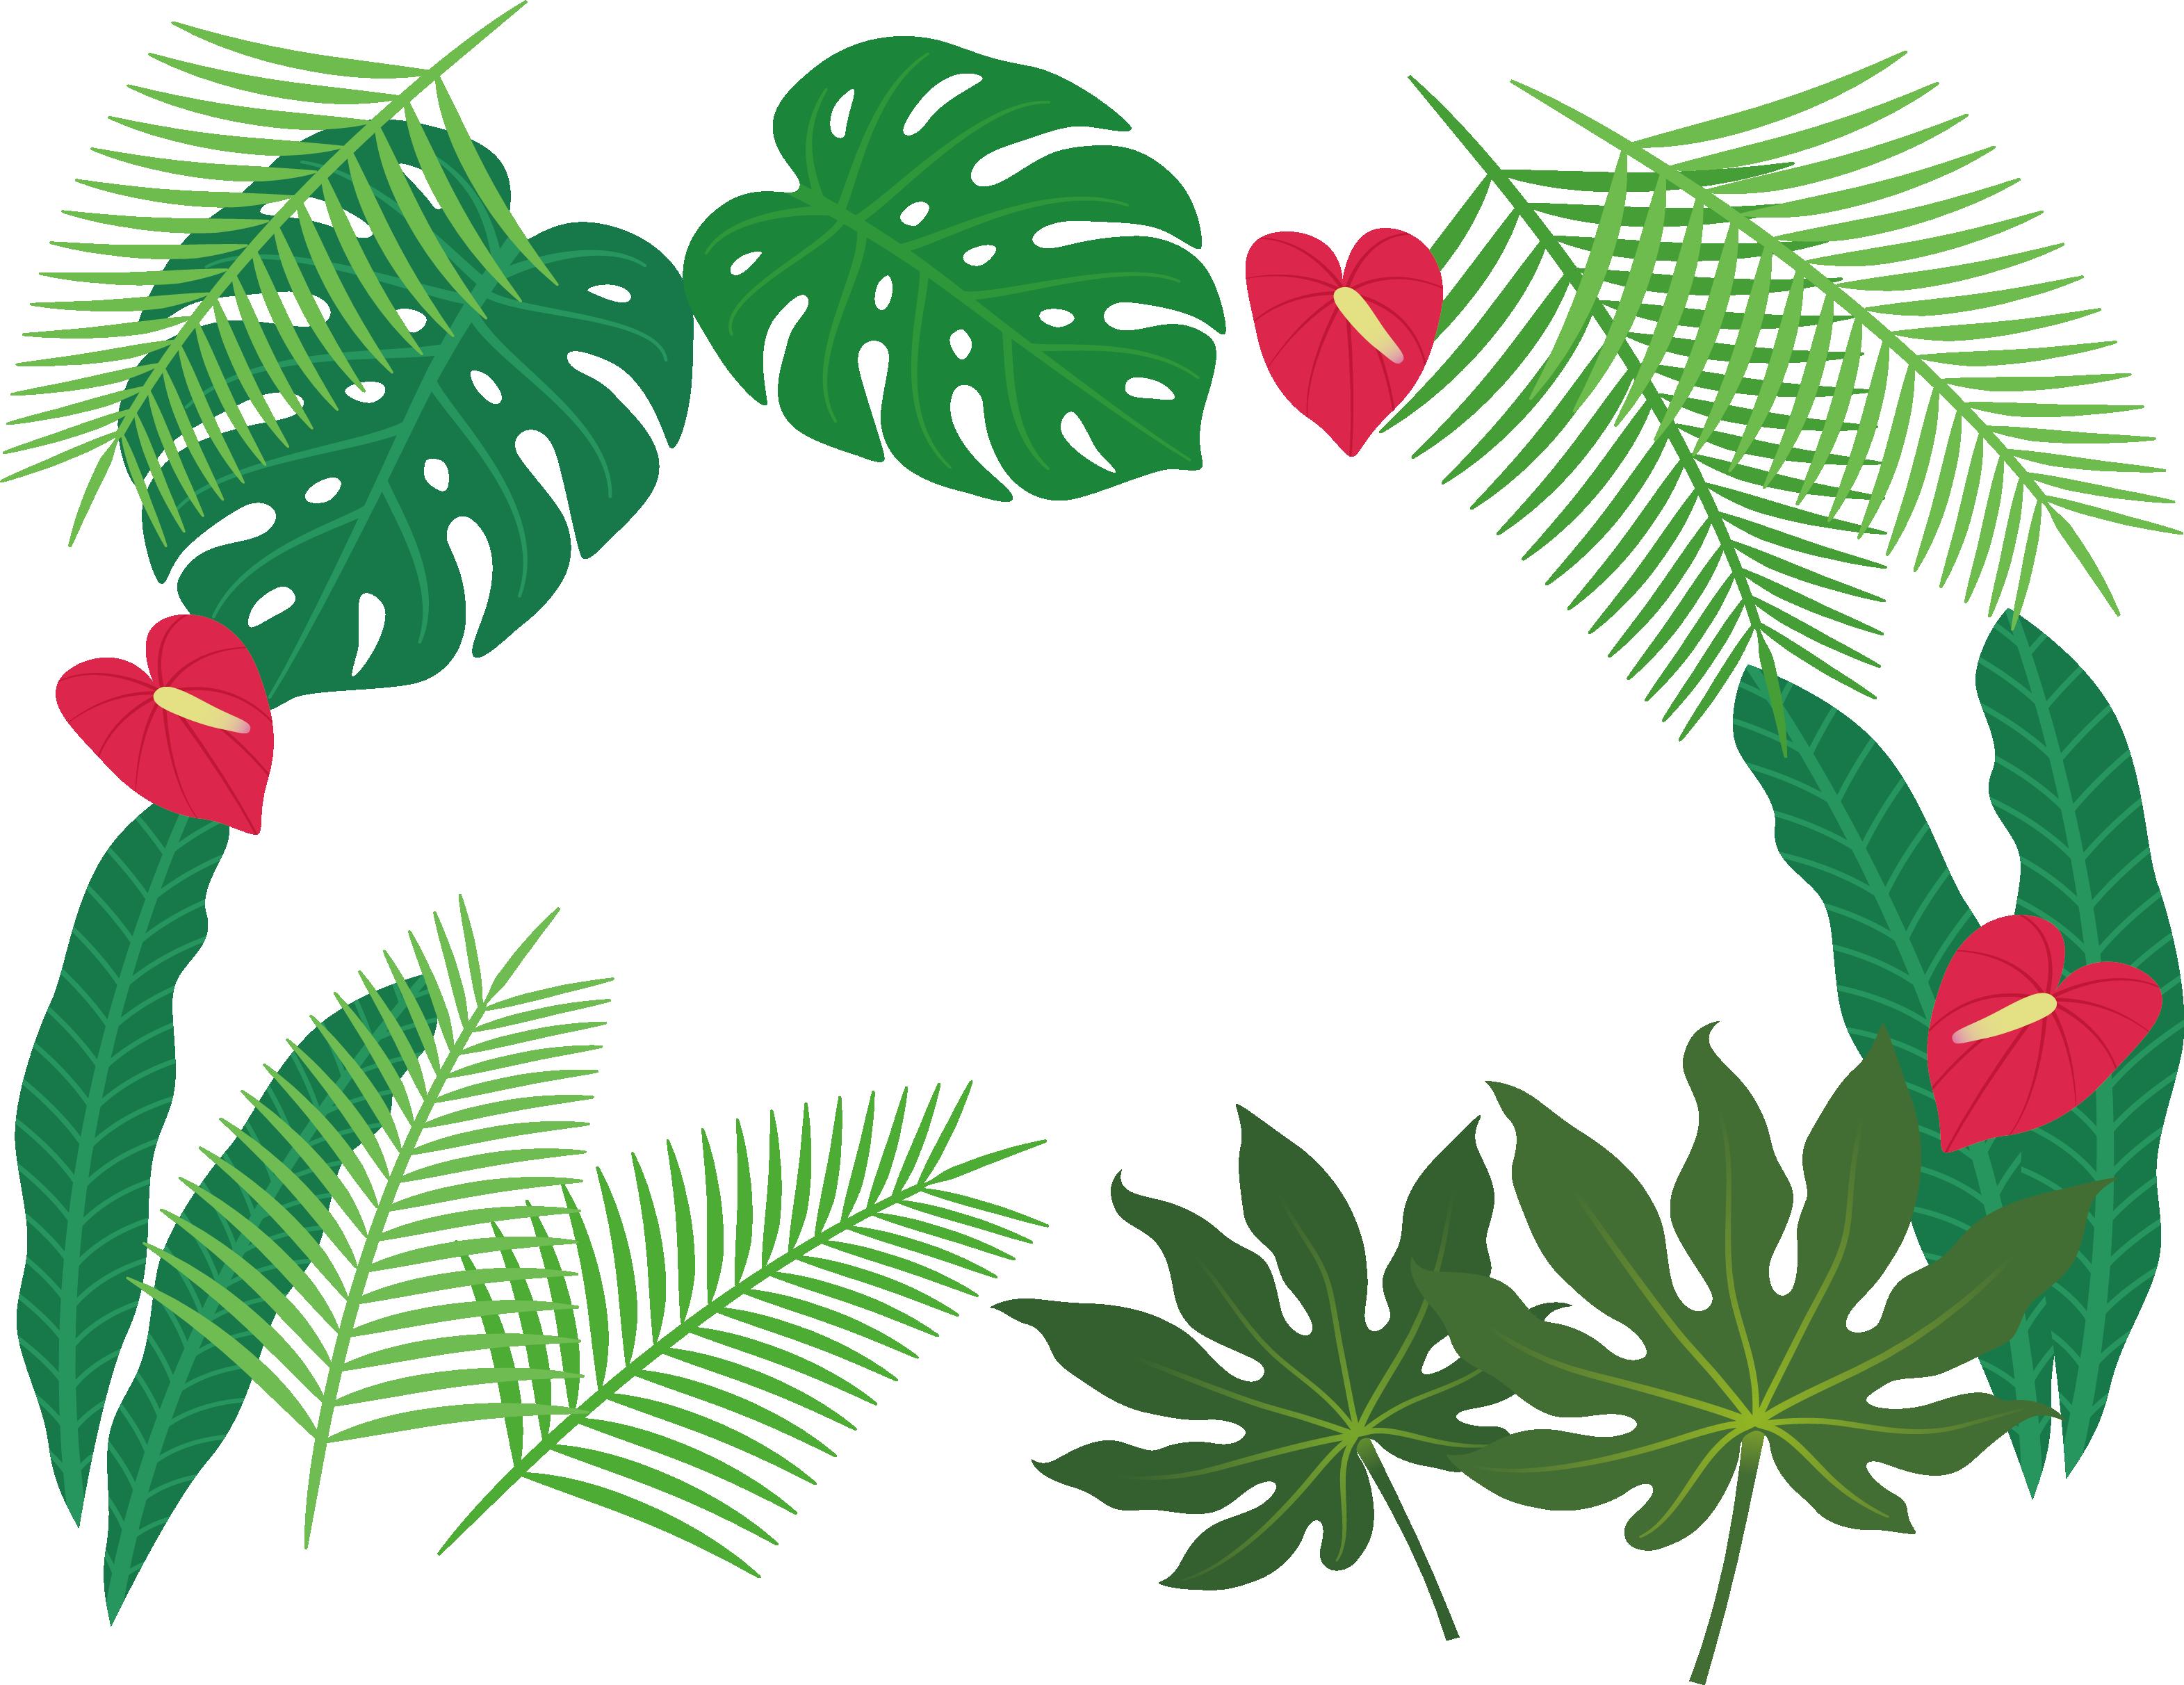 Clip Art Tropical Plant Leaves Border Transprent Tropical Leaves Tropical Vector Png Transparent Cartoon Jing Fm 115,000+ vectors, stock photos & psd files. clip art tropical plant leaves border